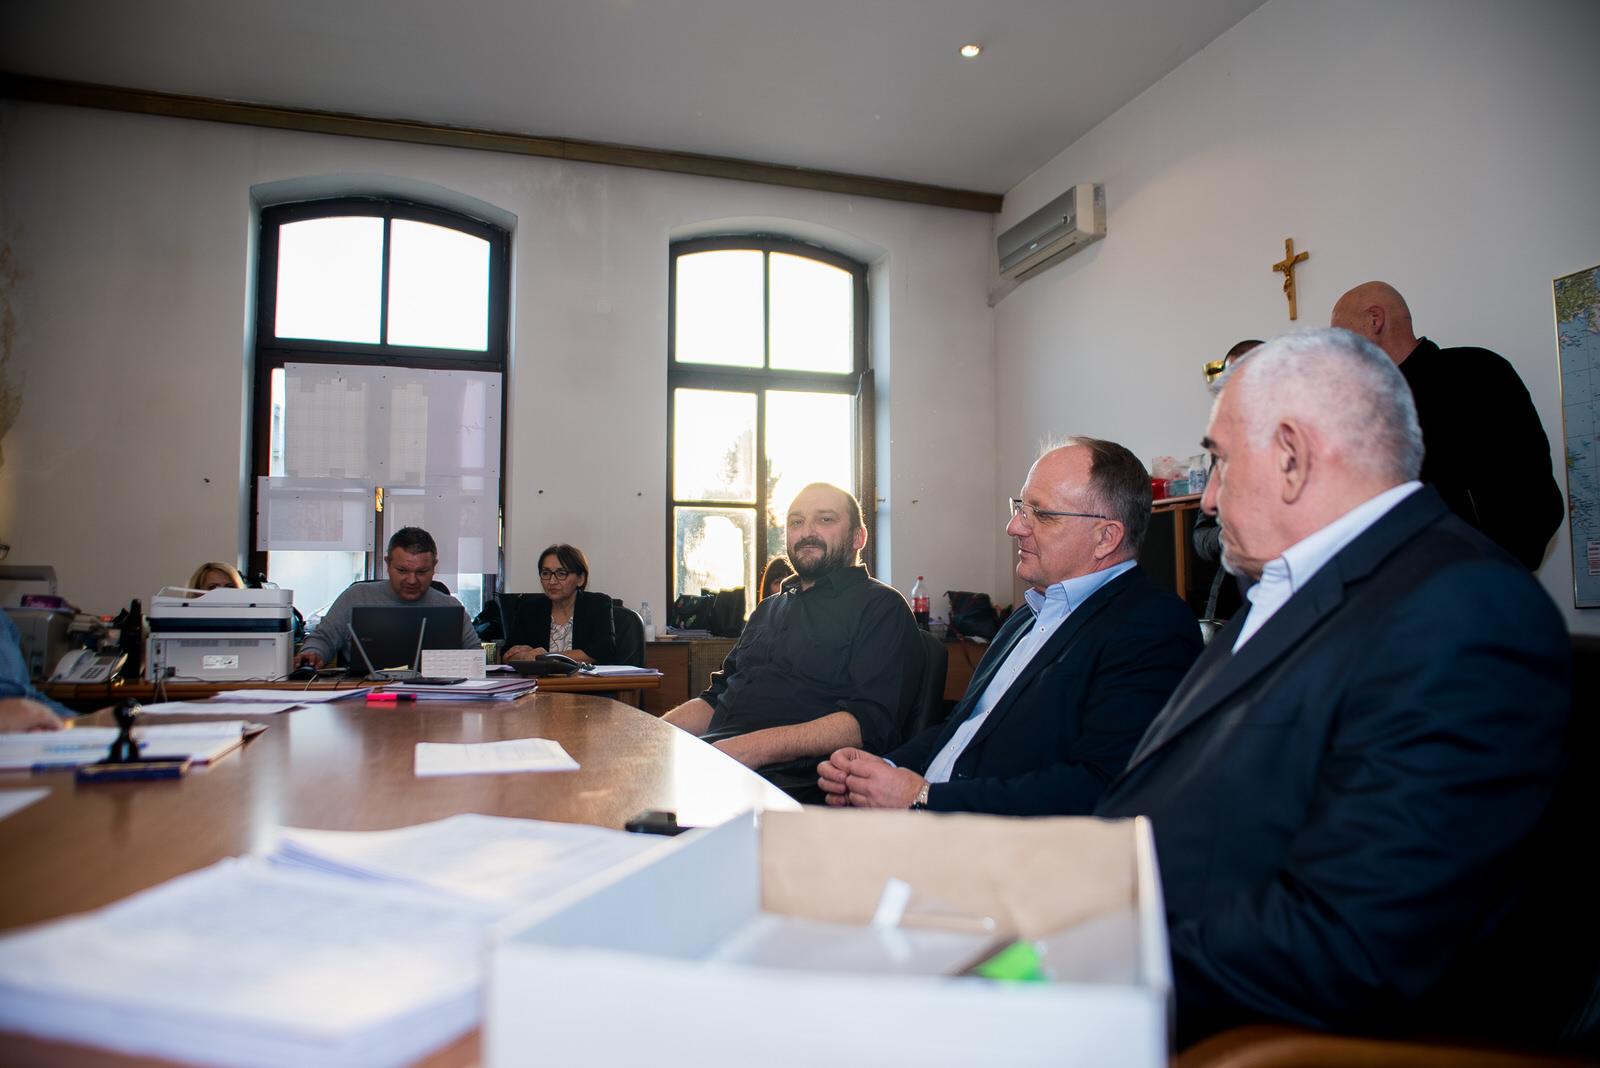 likaclub_politika-gospić_2019_bura-promjena-12